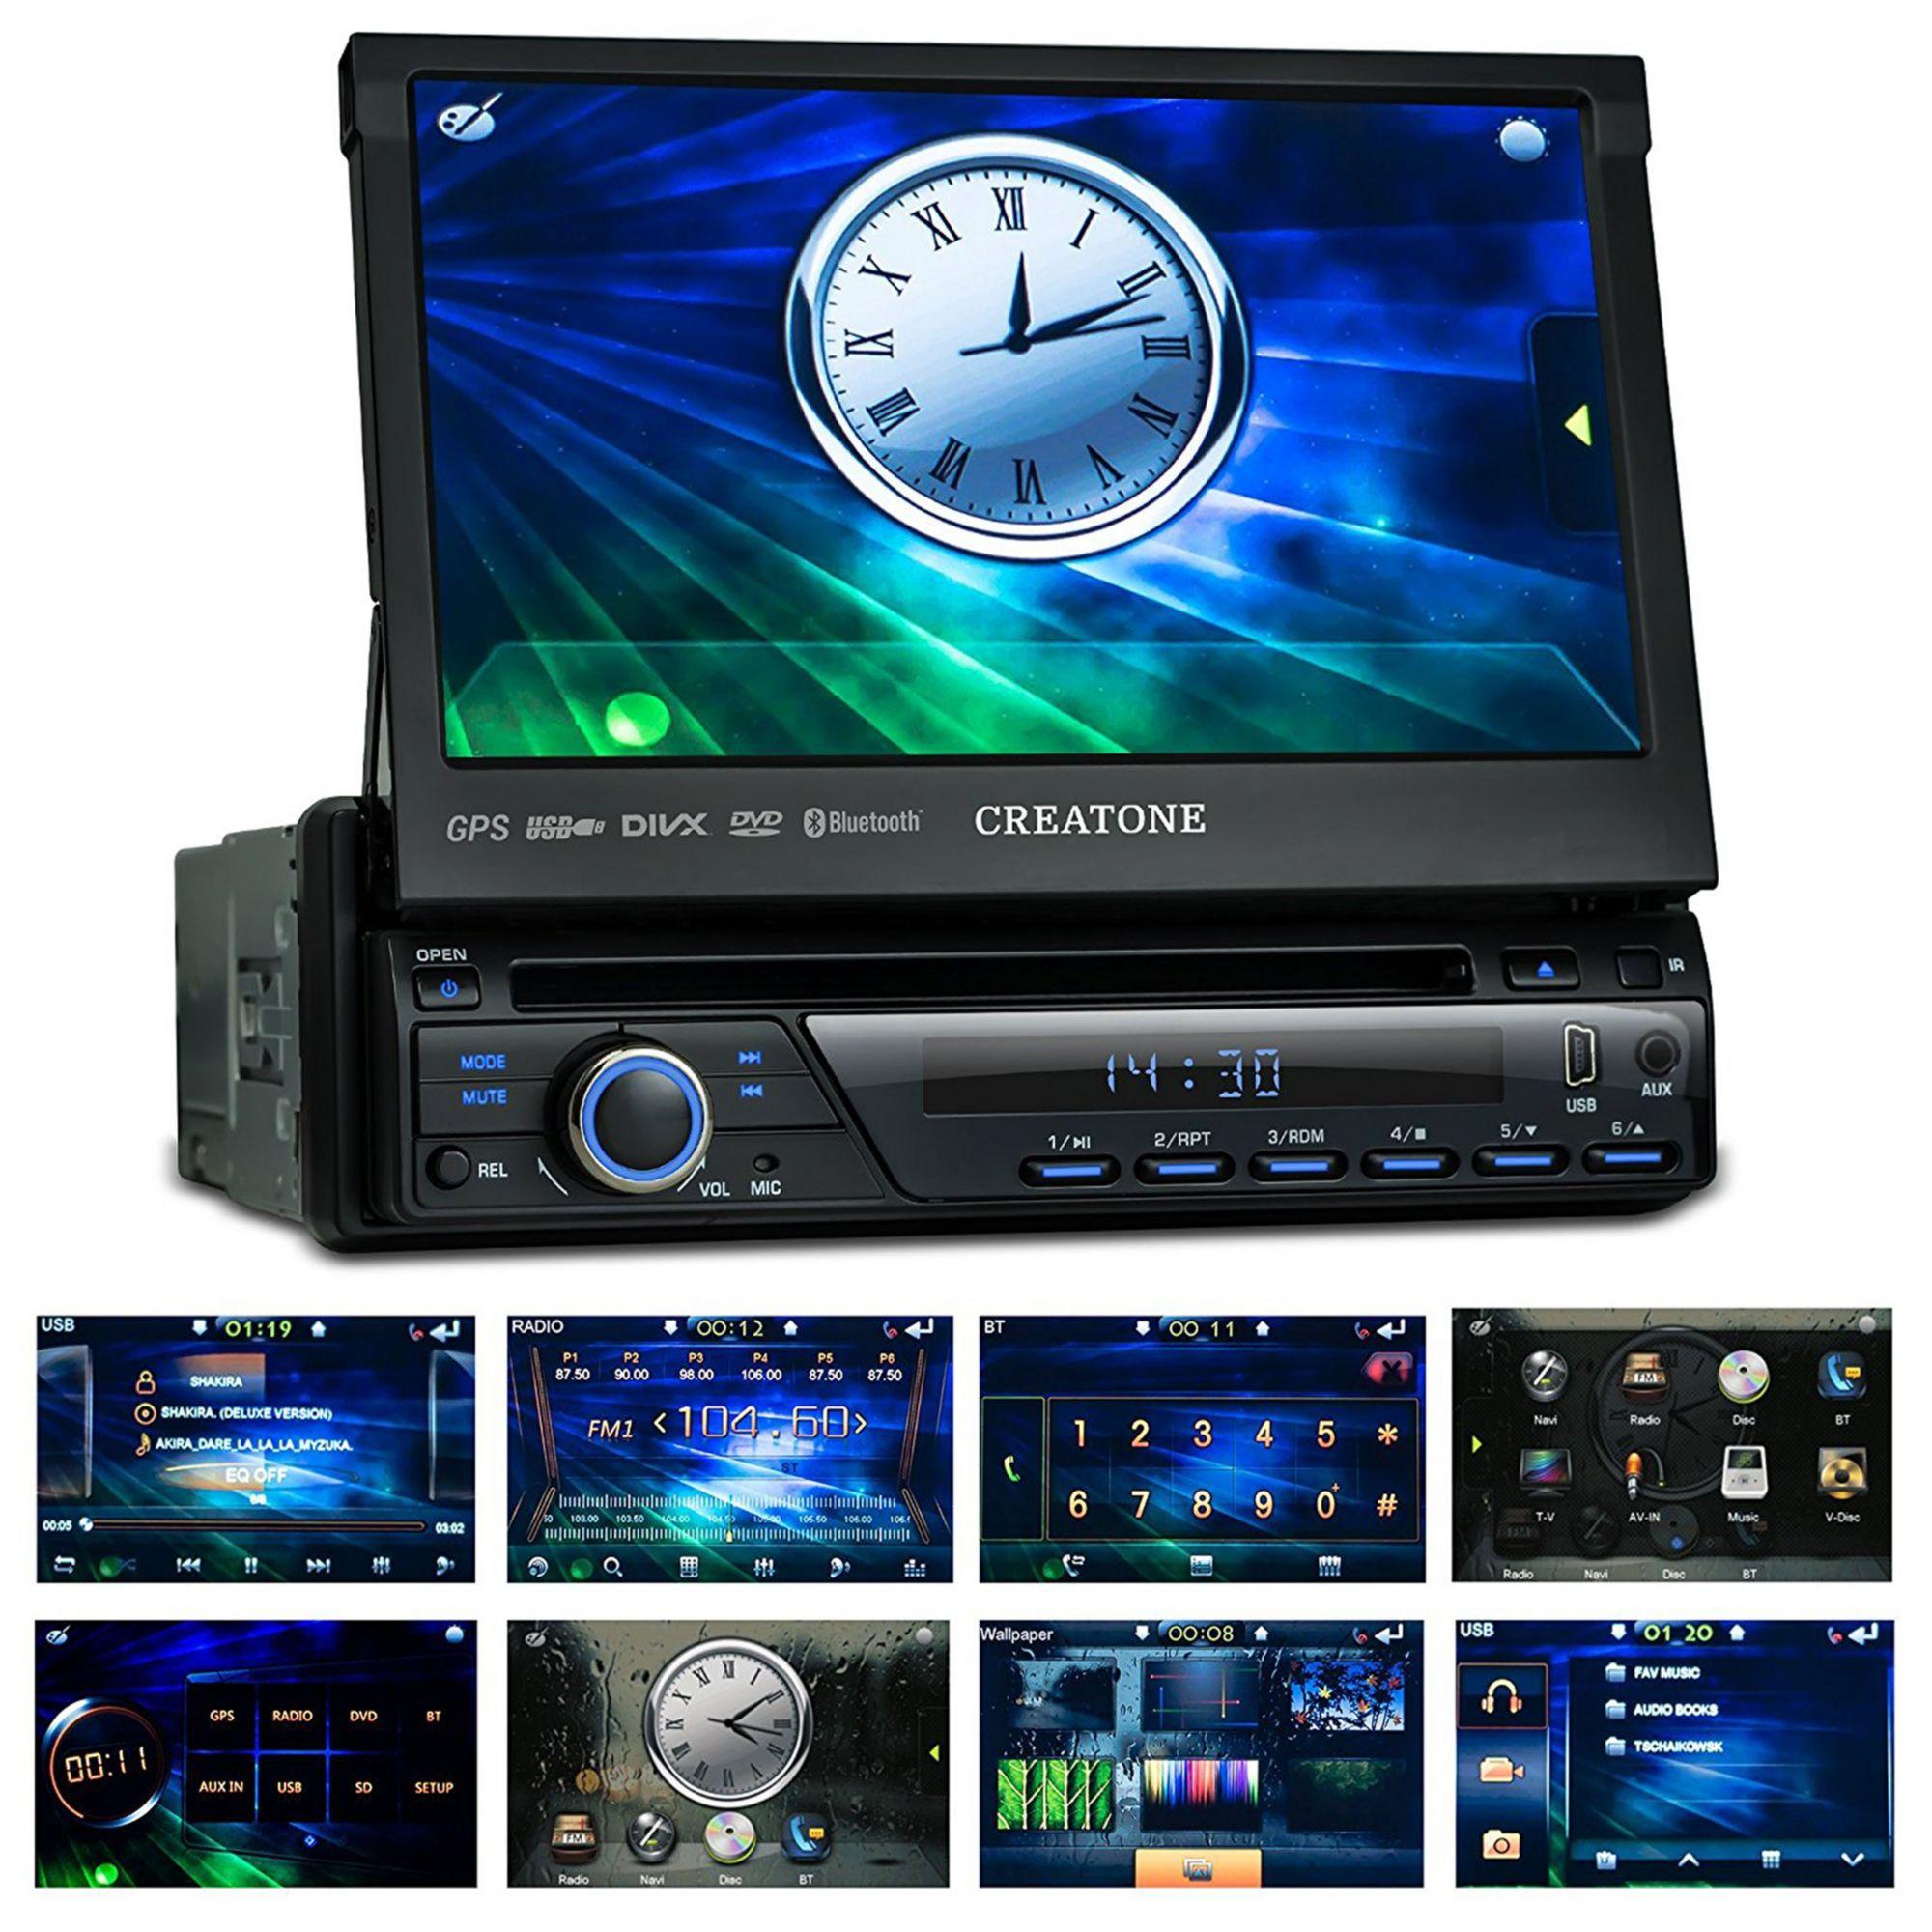 CREATONE Creatone 1-DIN Autoradio mit Navigation, Bluetooth & CD-/ DVD-Player »CTN-8423D26«